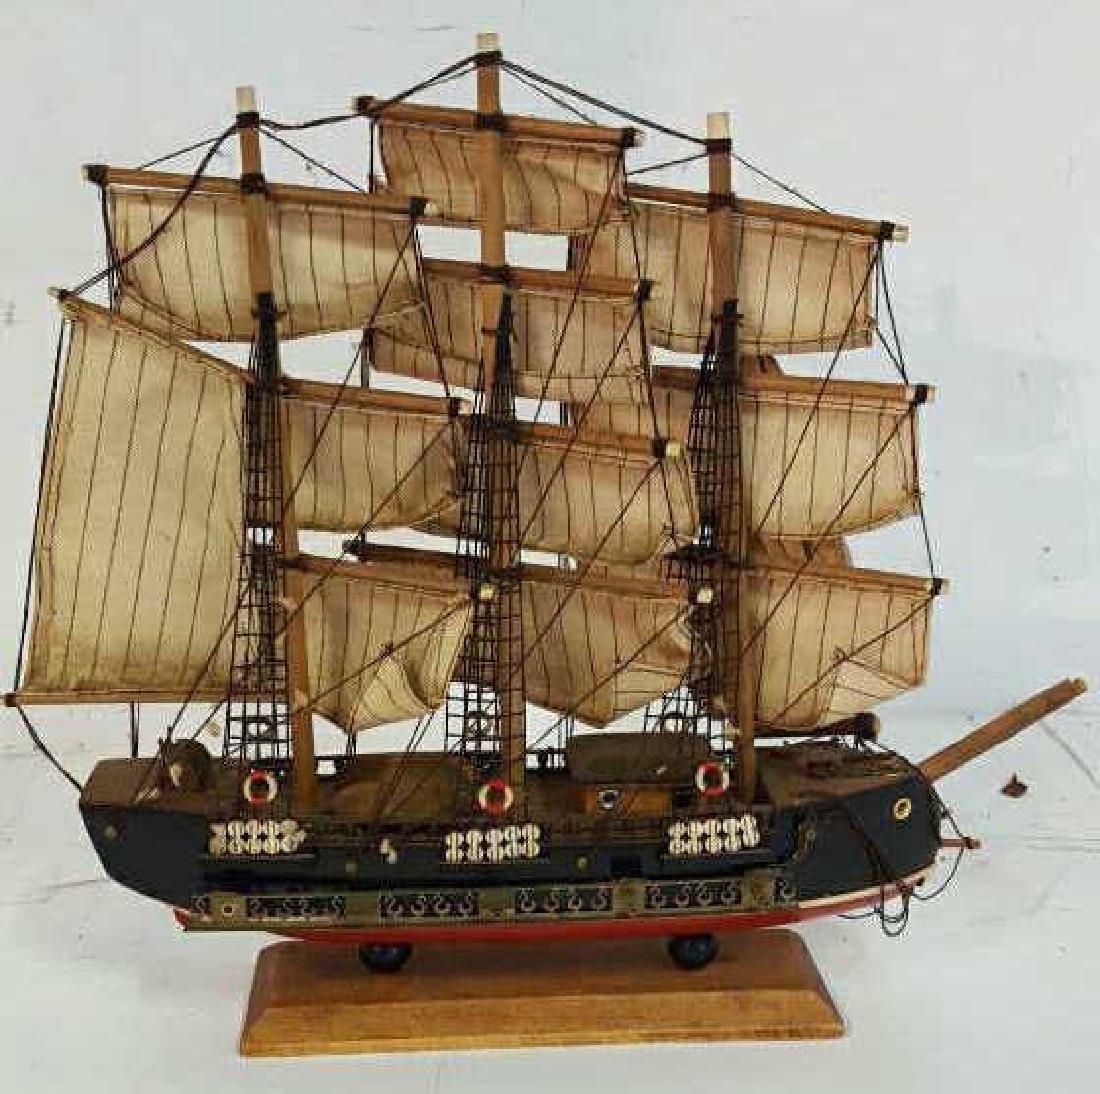 Bergantin Siglo XVIII Model Boat Bergantin Siglo XVIII - 7